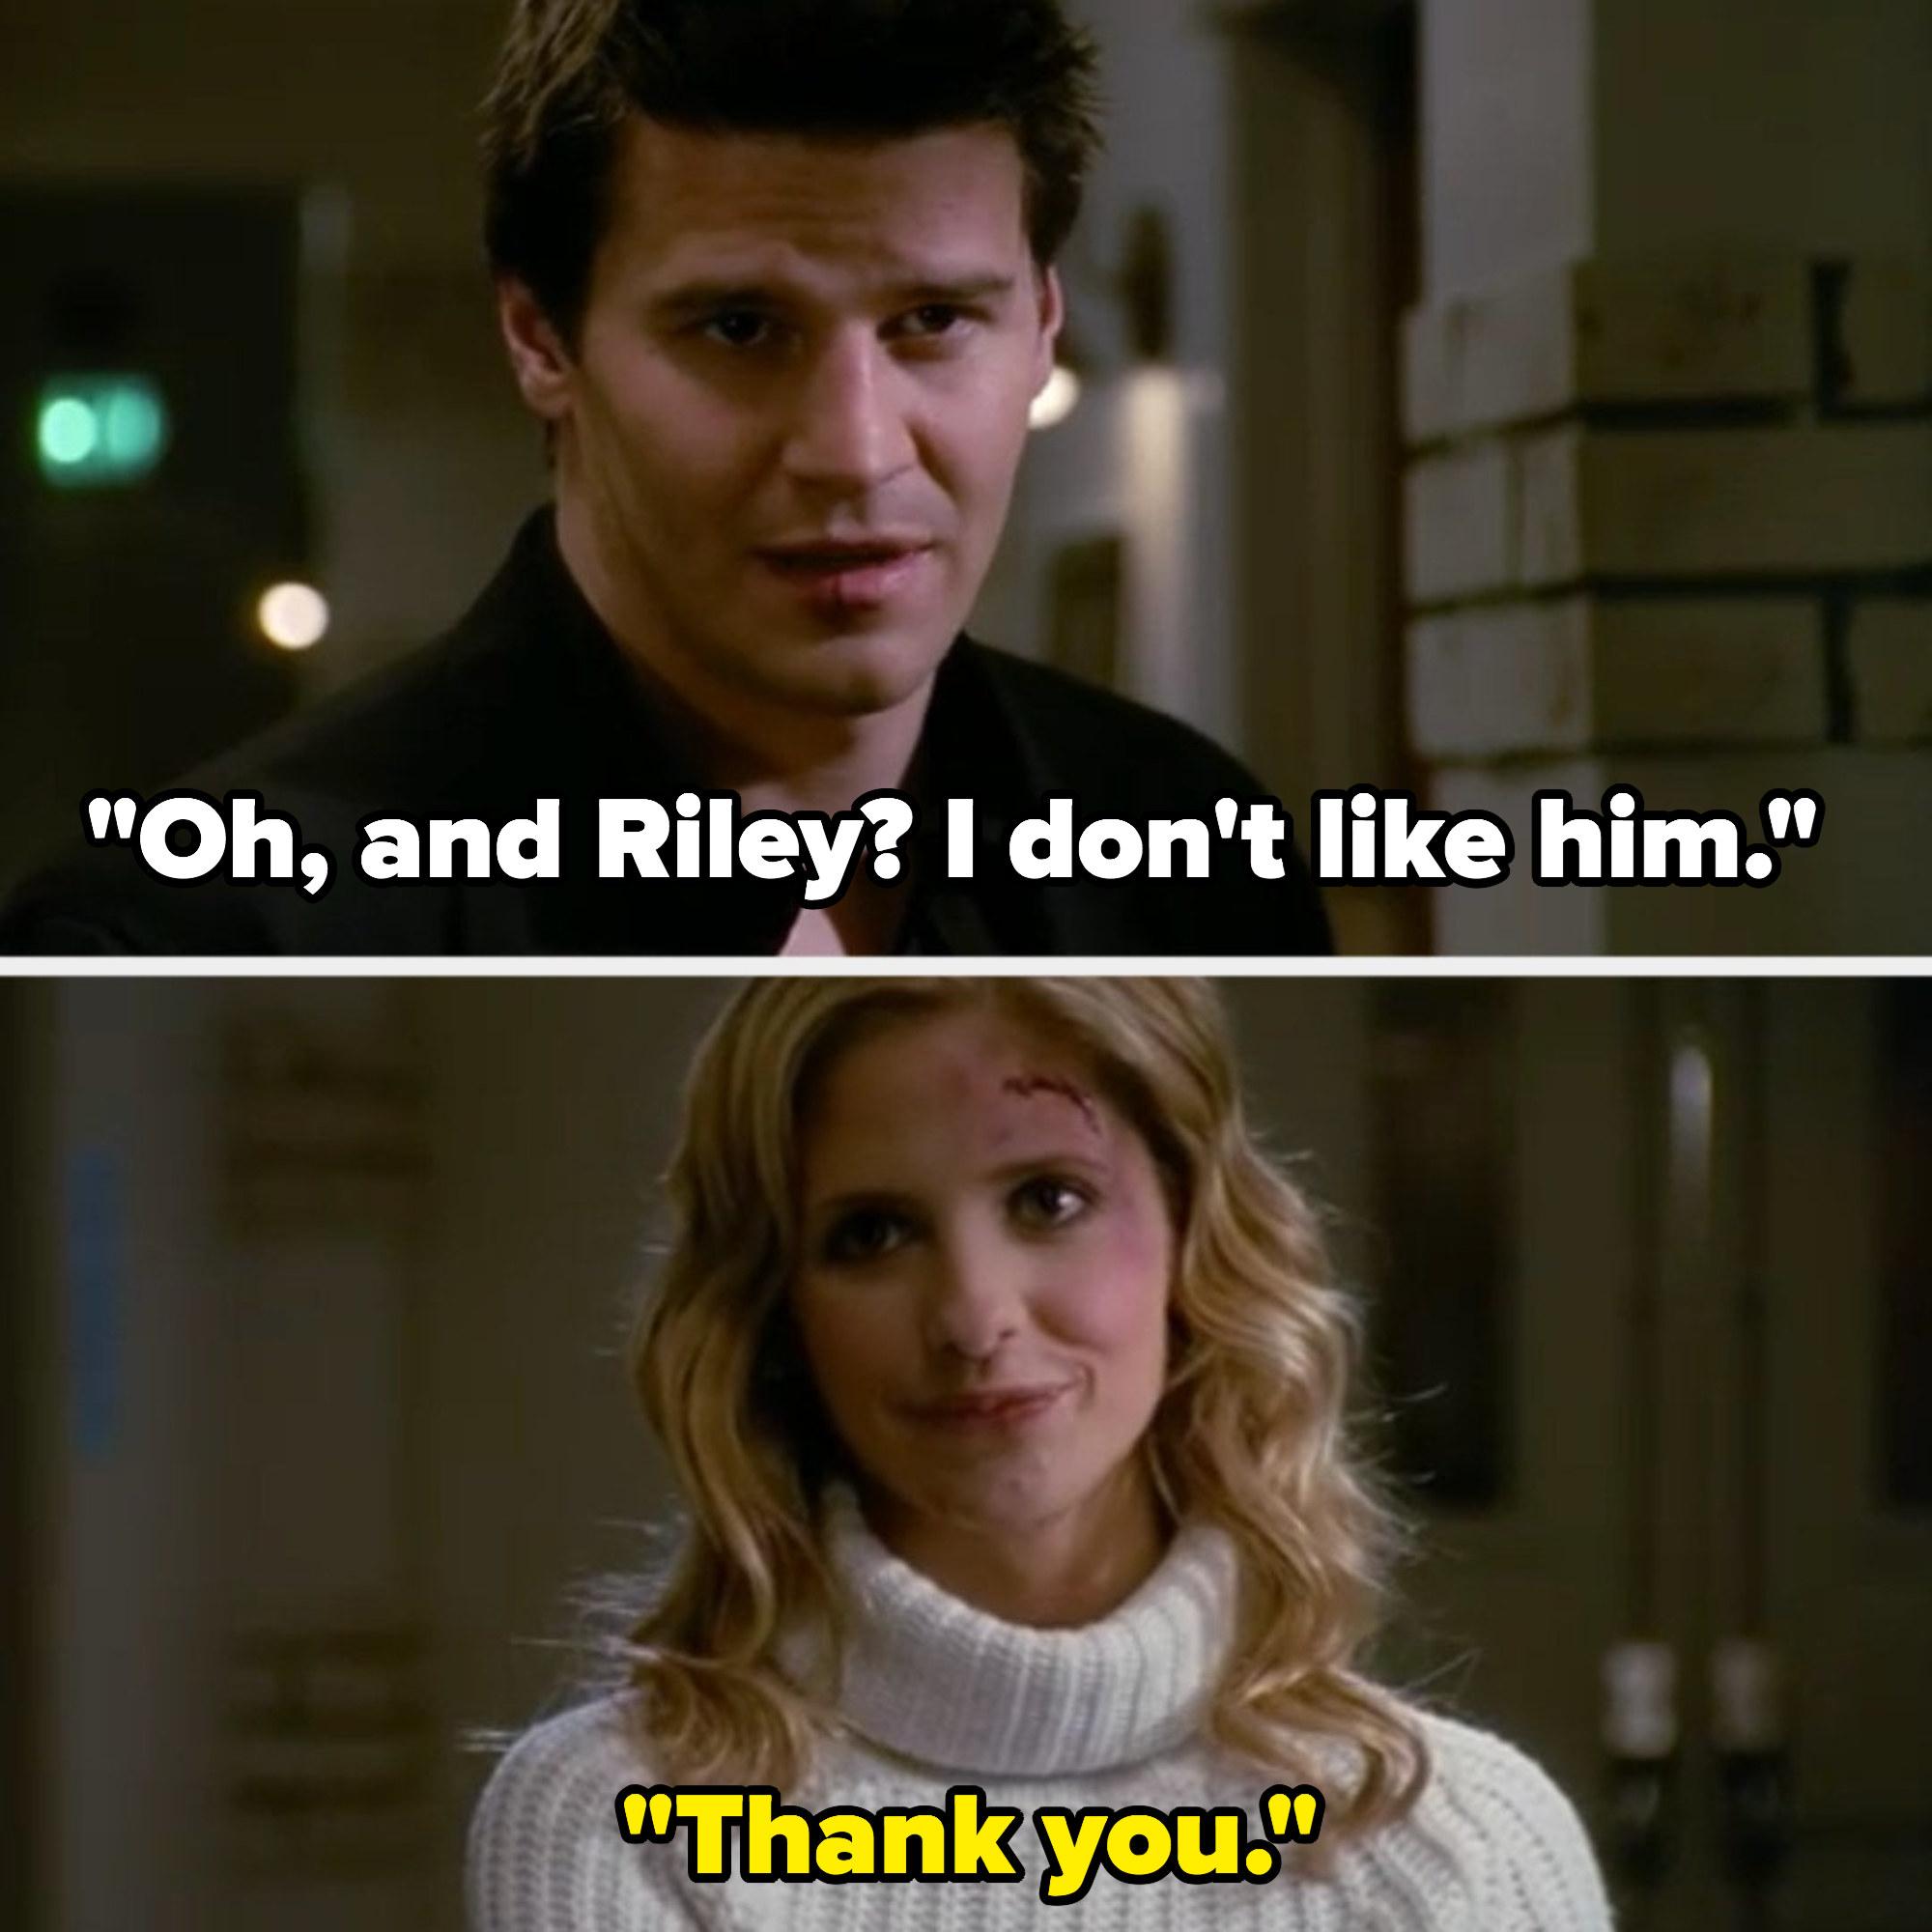 Angel says he doesn't like Riley